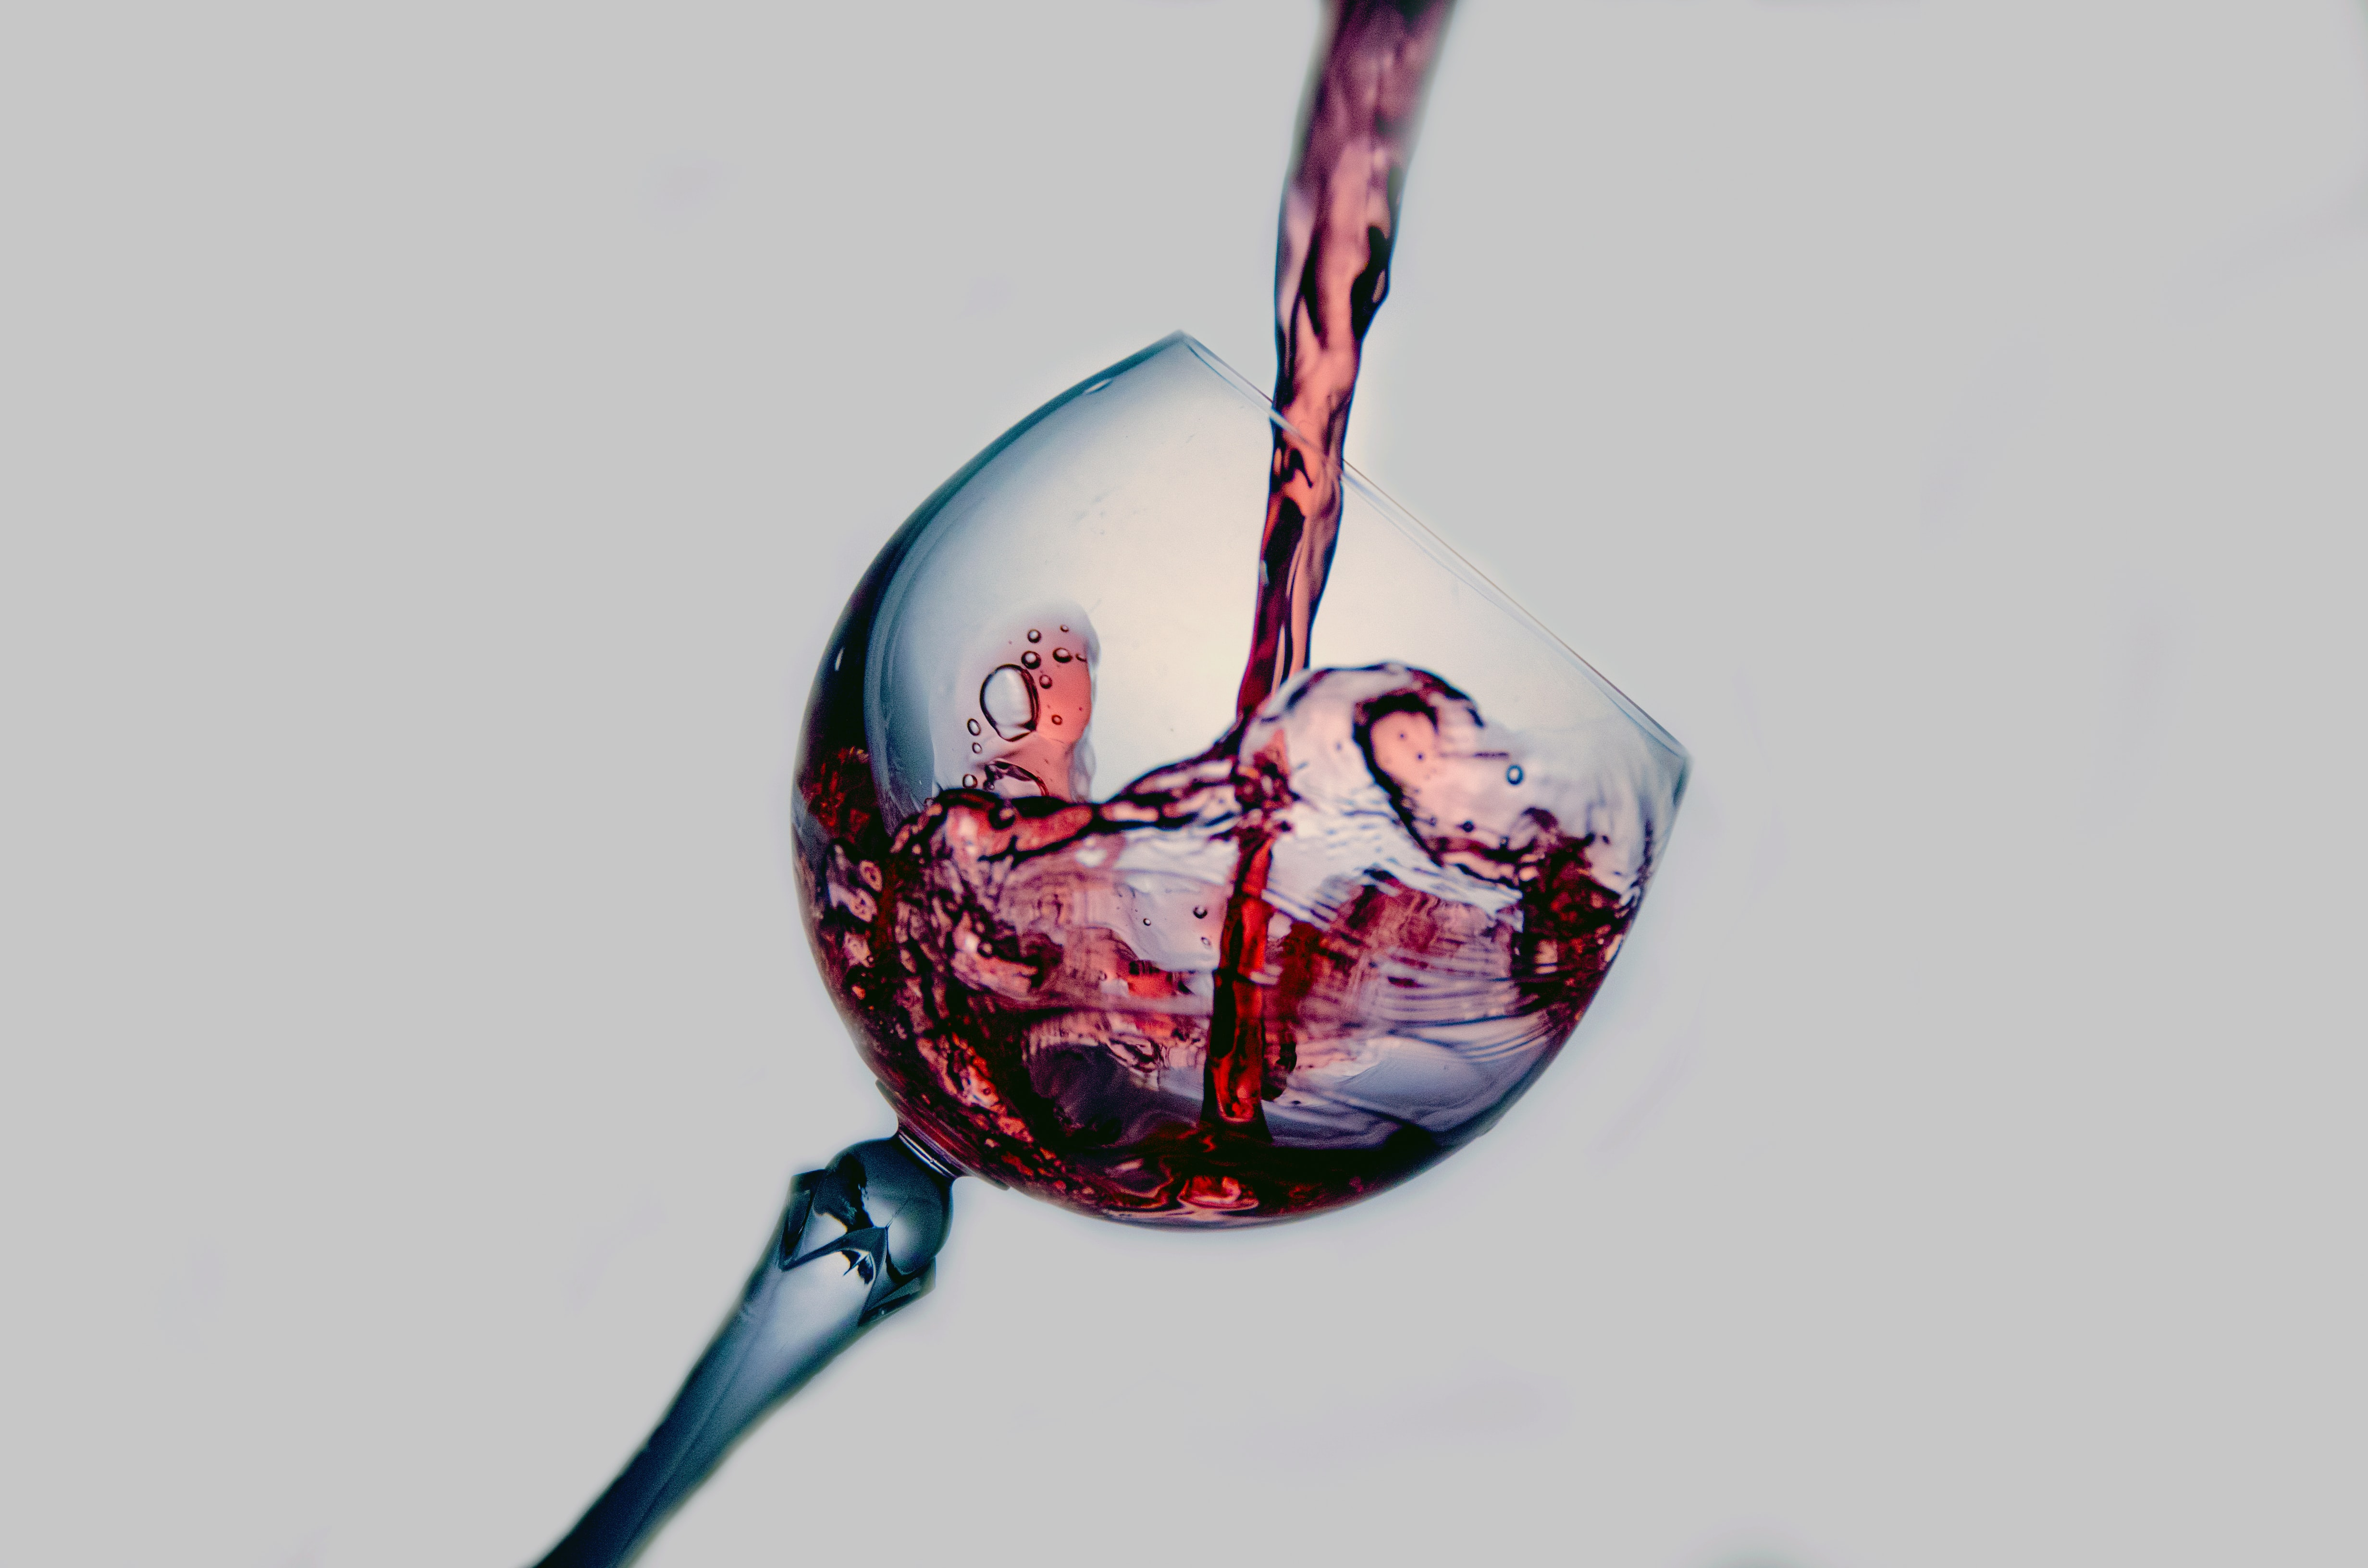 terry vlisidis 0dhIwRsPV74 unsplash - Miniguide til Chardonnay vin